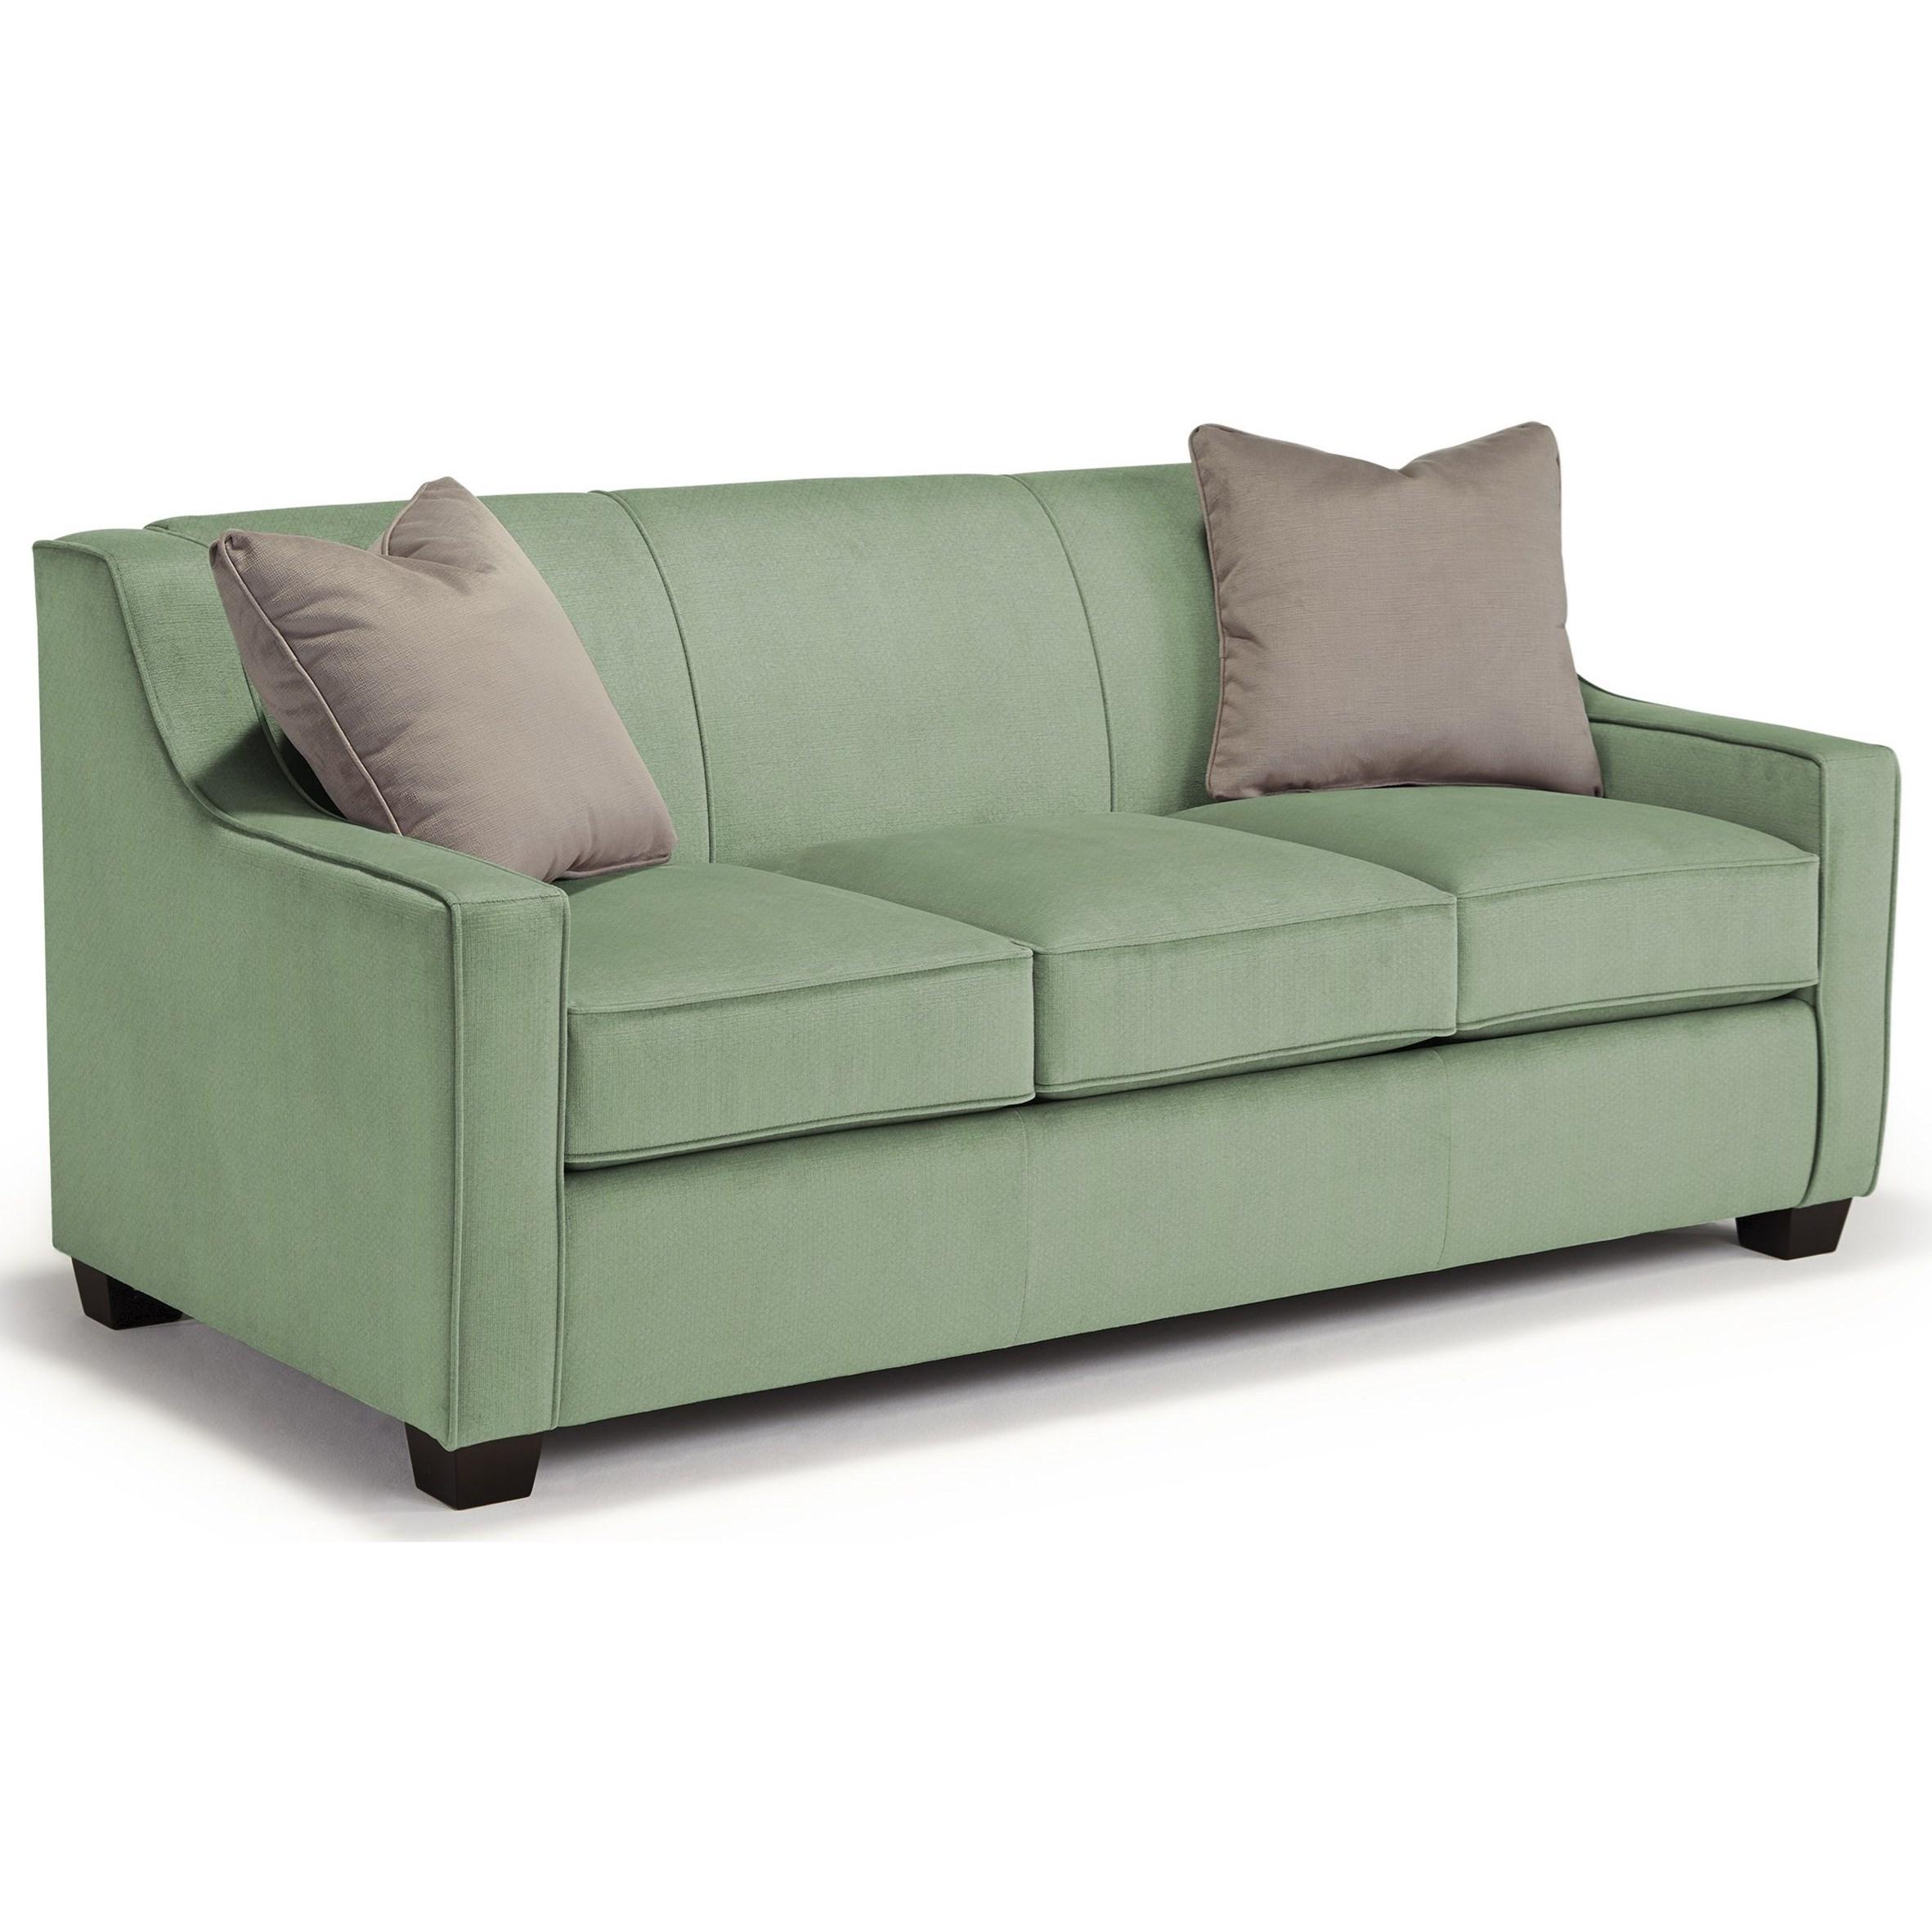 Marinette Full Sleeper by Best Home Furnishings at Pedigo Furniture